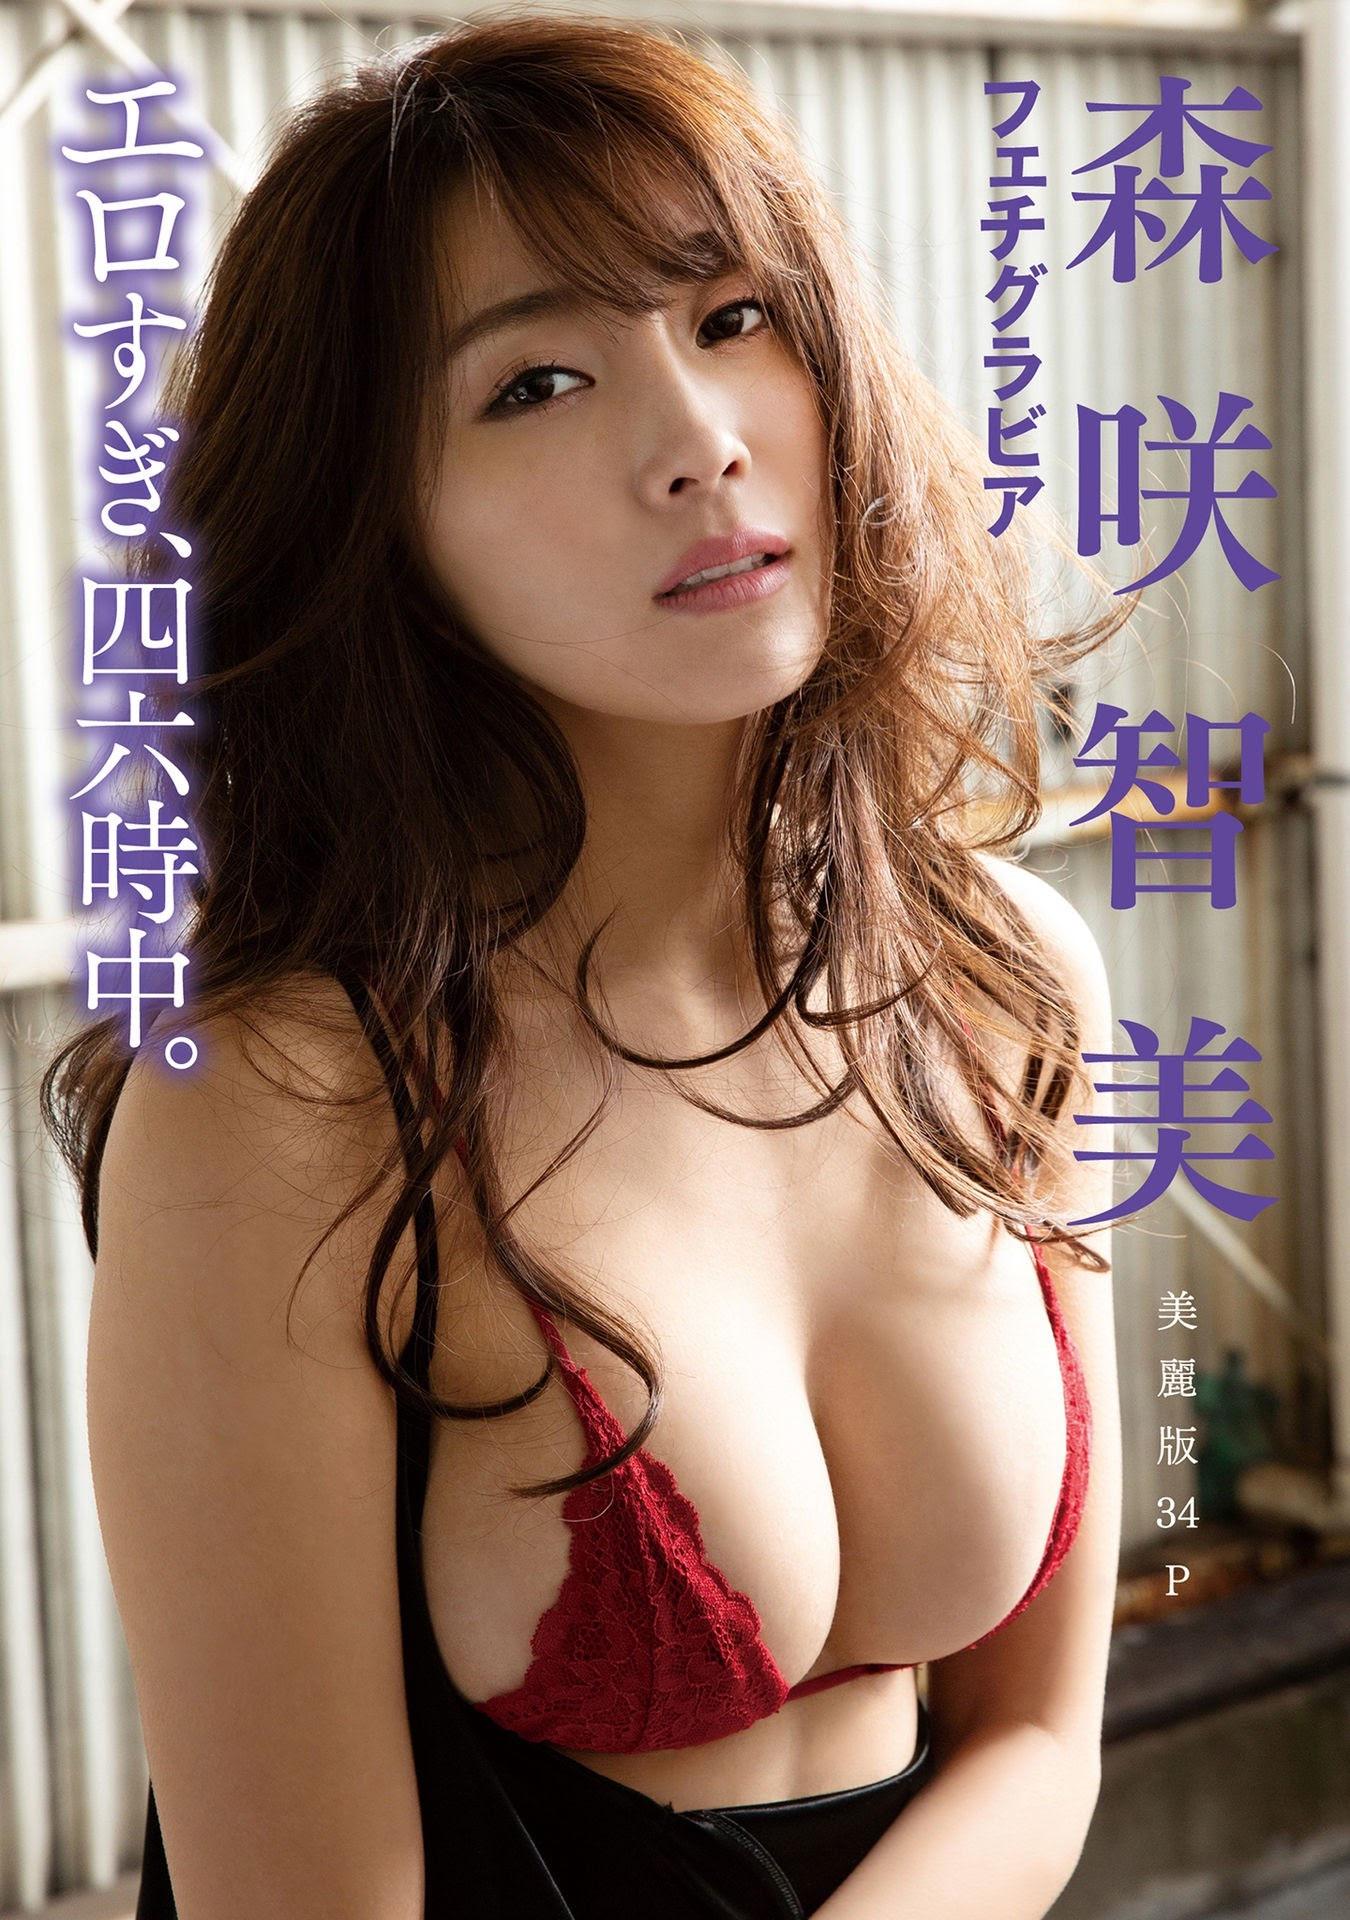 Harem 森咲智美 photo1-001